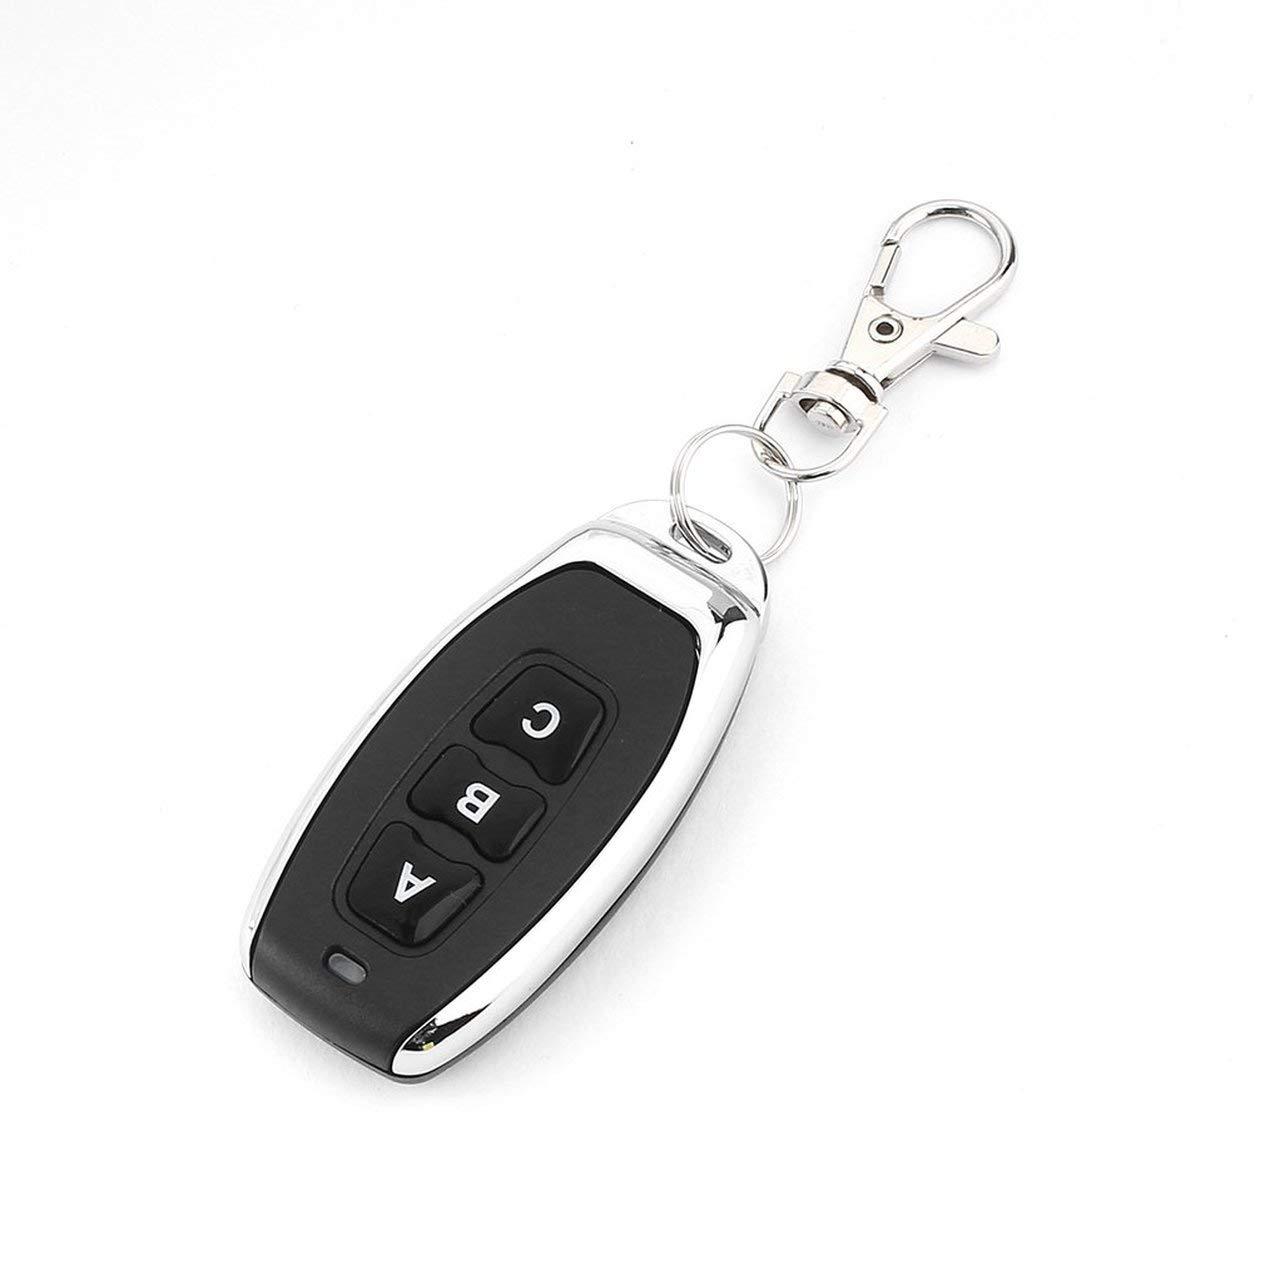 433MHz Wireless Metal 3 Key Garage Door Duplicator Learning Code Key Fob Control DC 6V Universal Copy Auto Car Alarm System